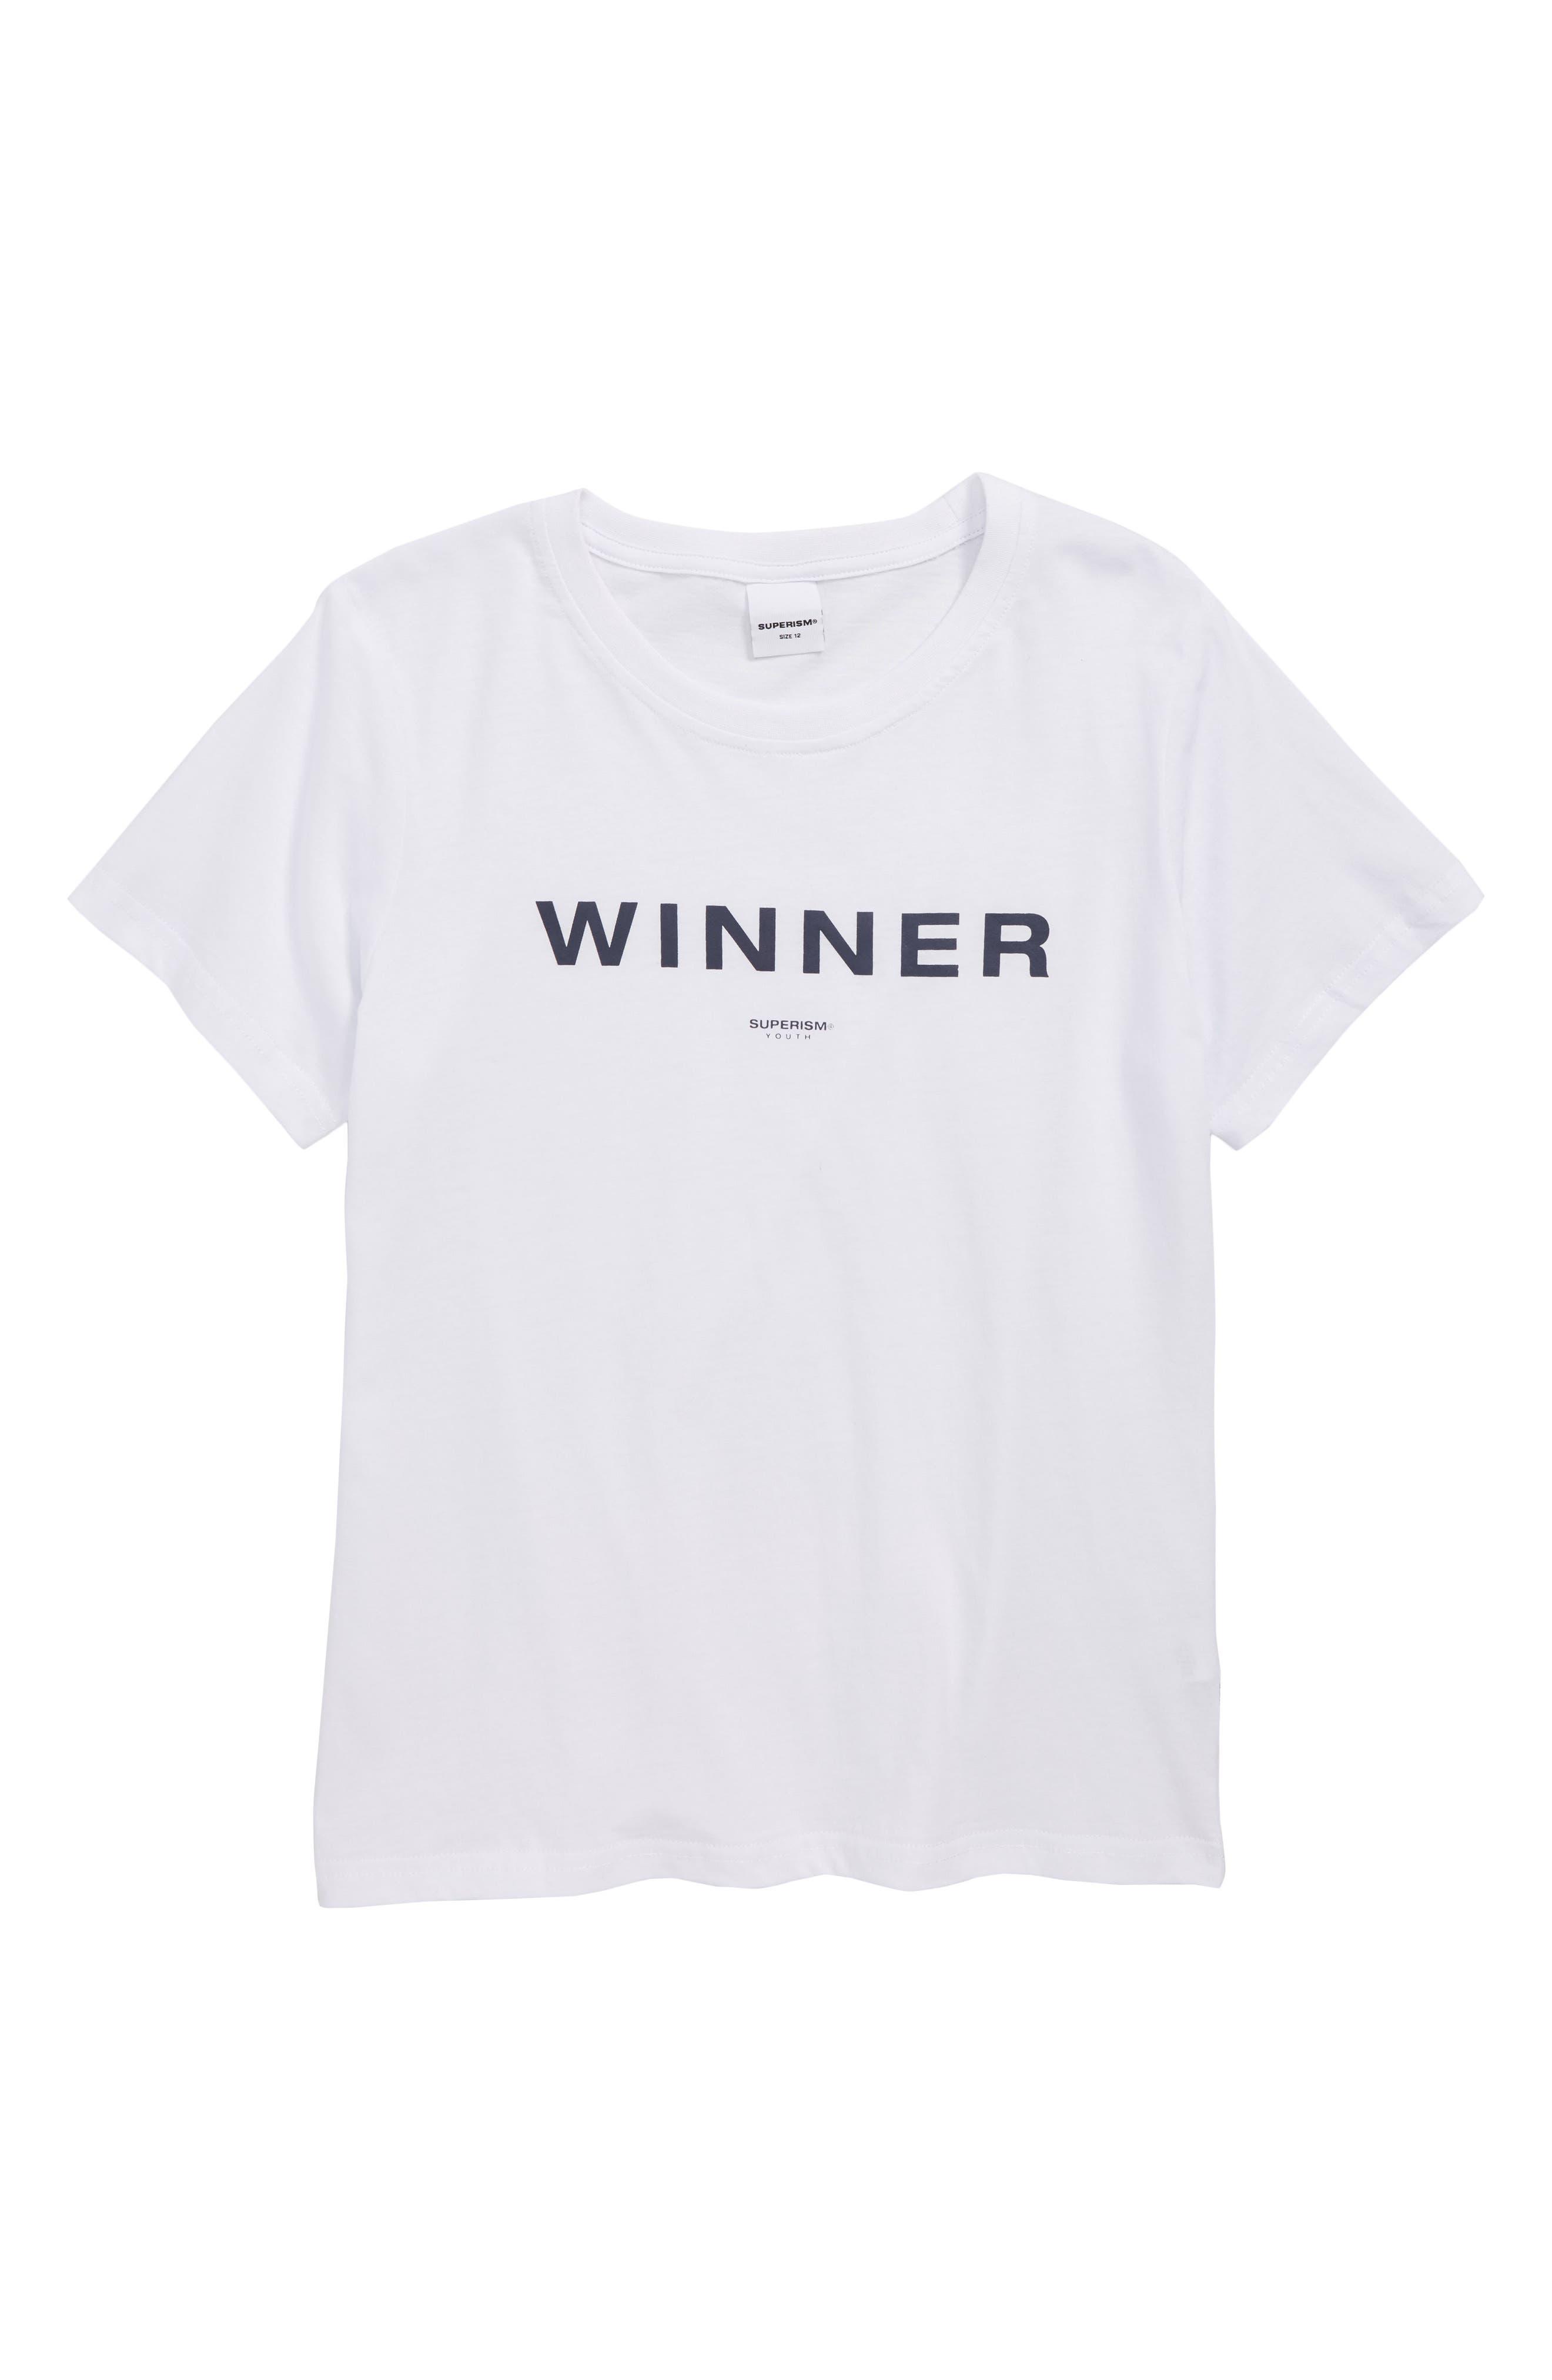 Winner Graphic T-Shirt,                         Main,                         color, 100